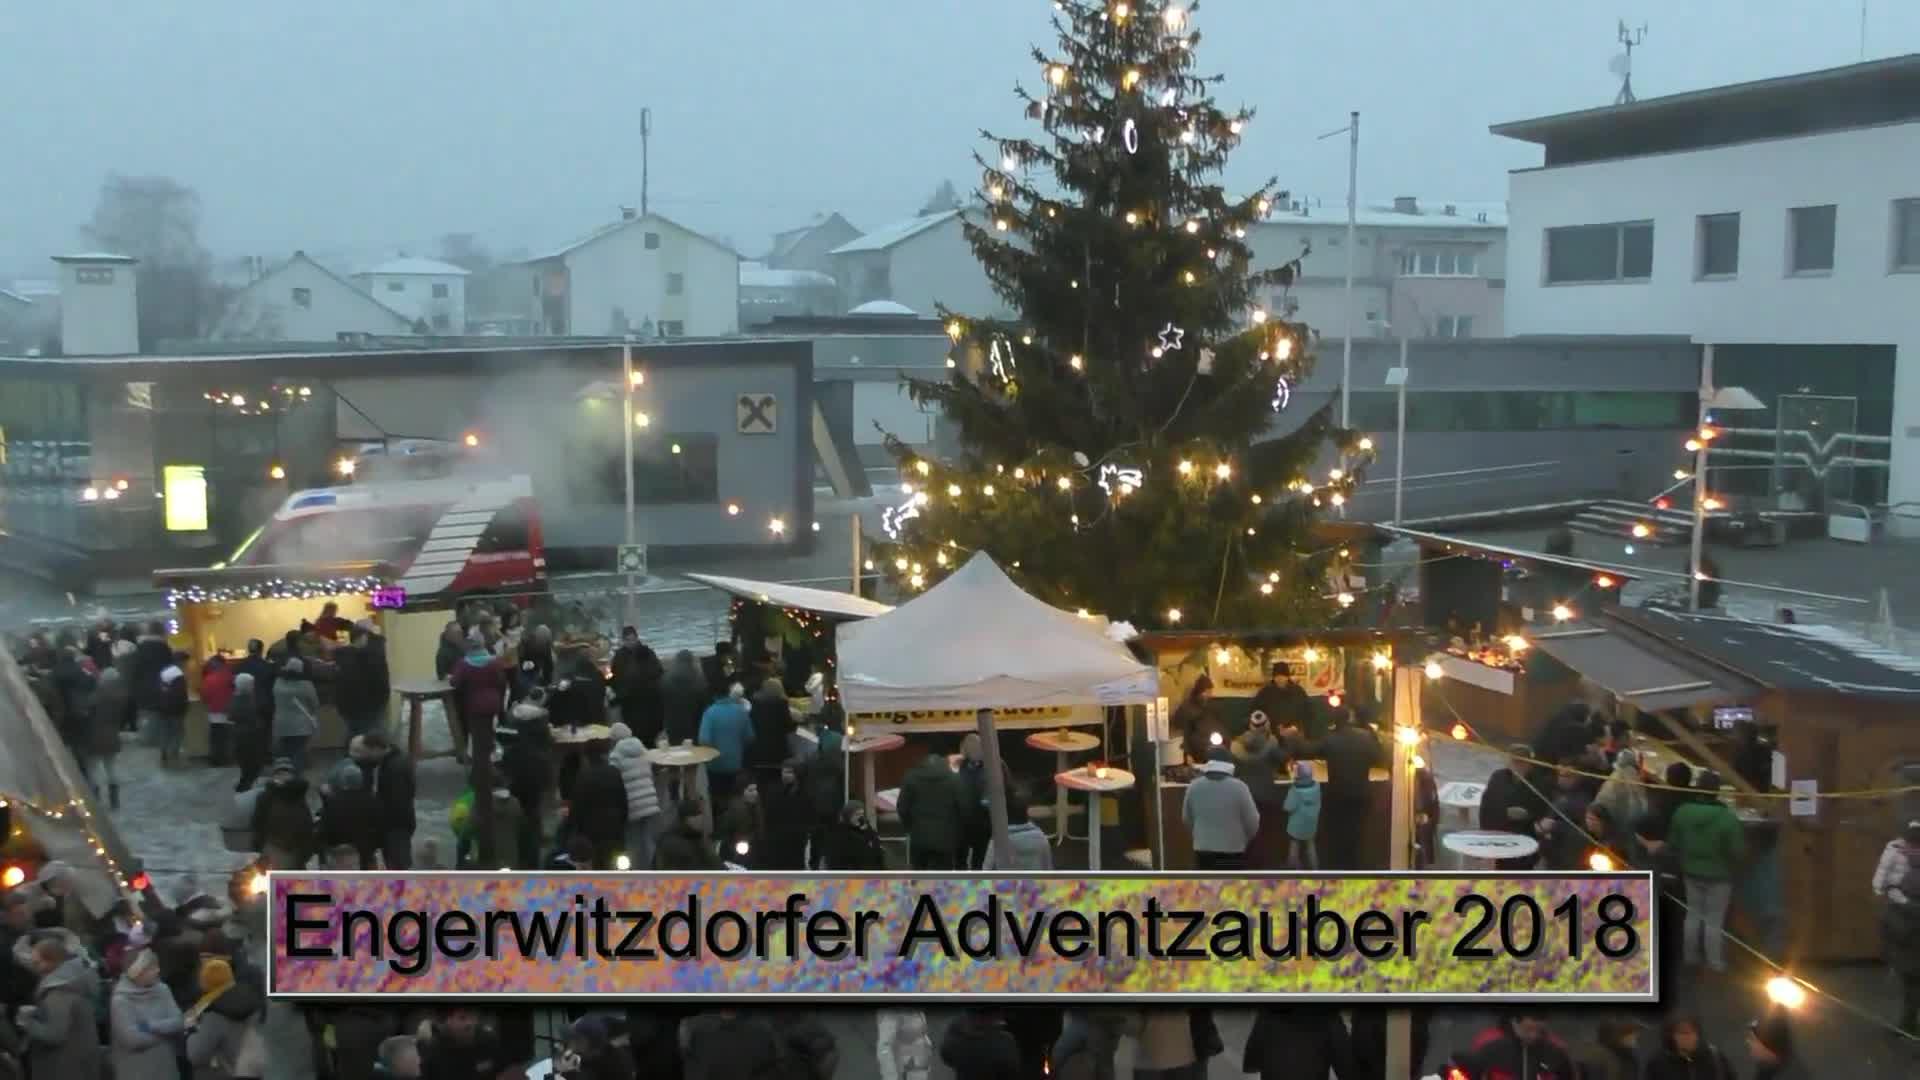 Engerwitzdorfer Adventzauber 2018